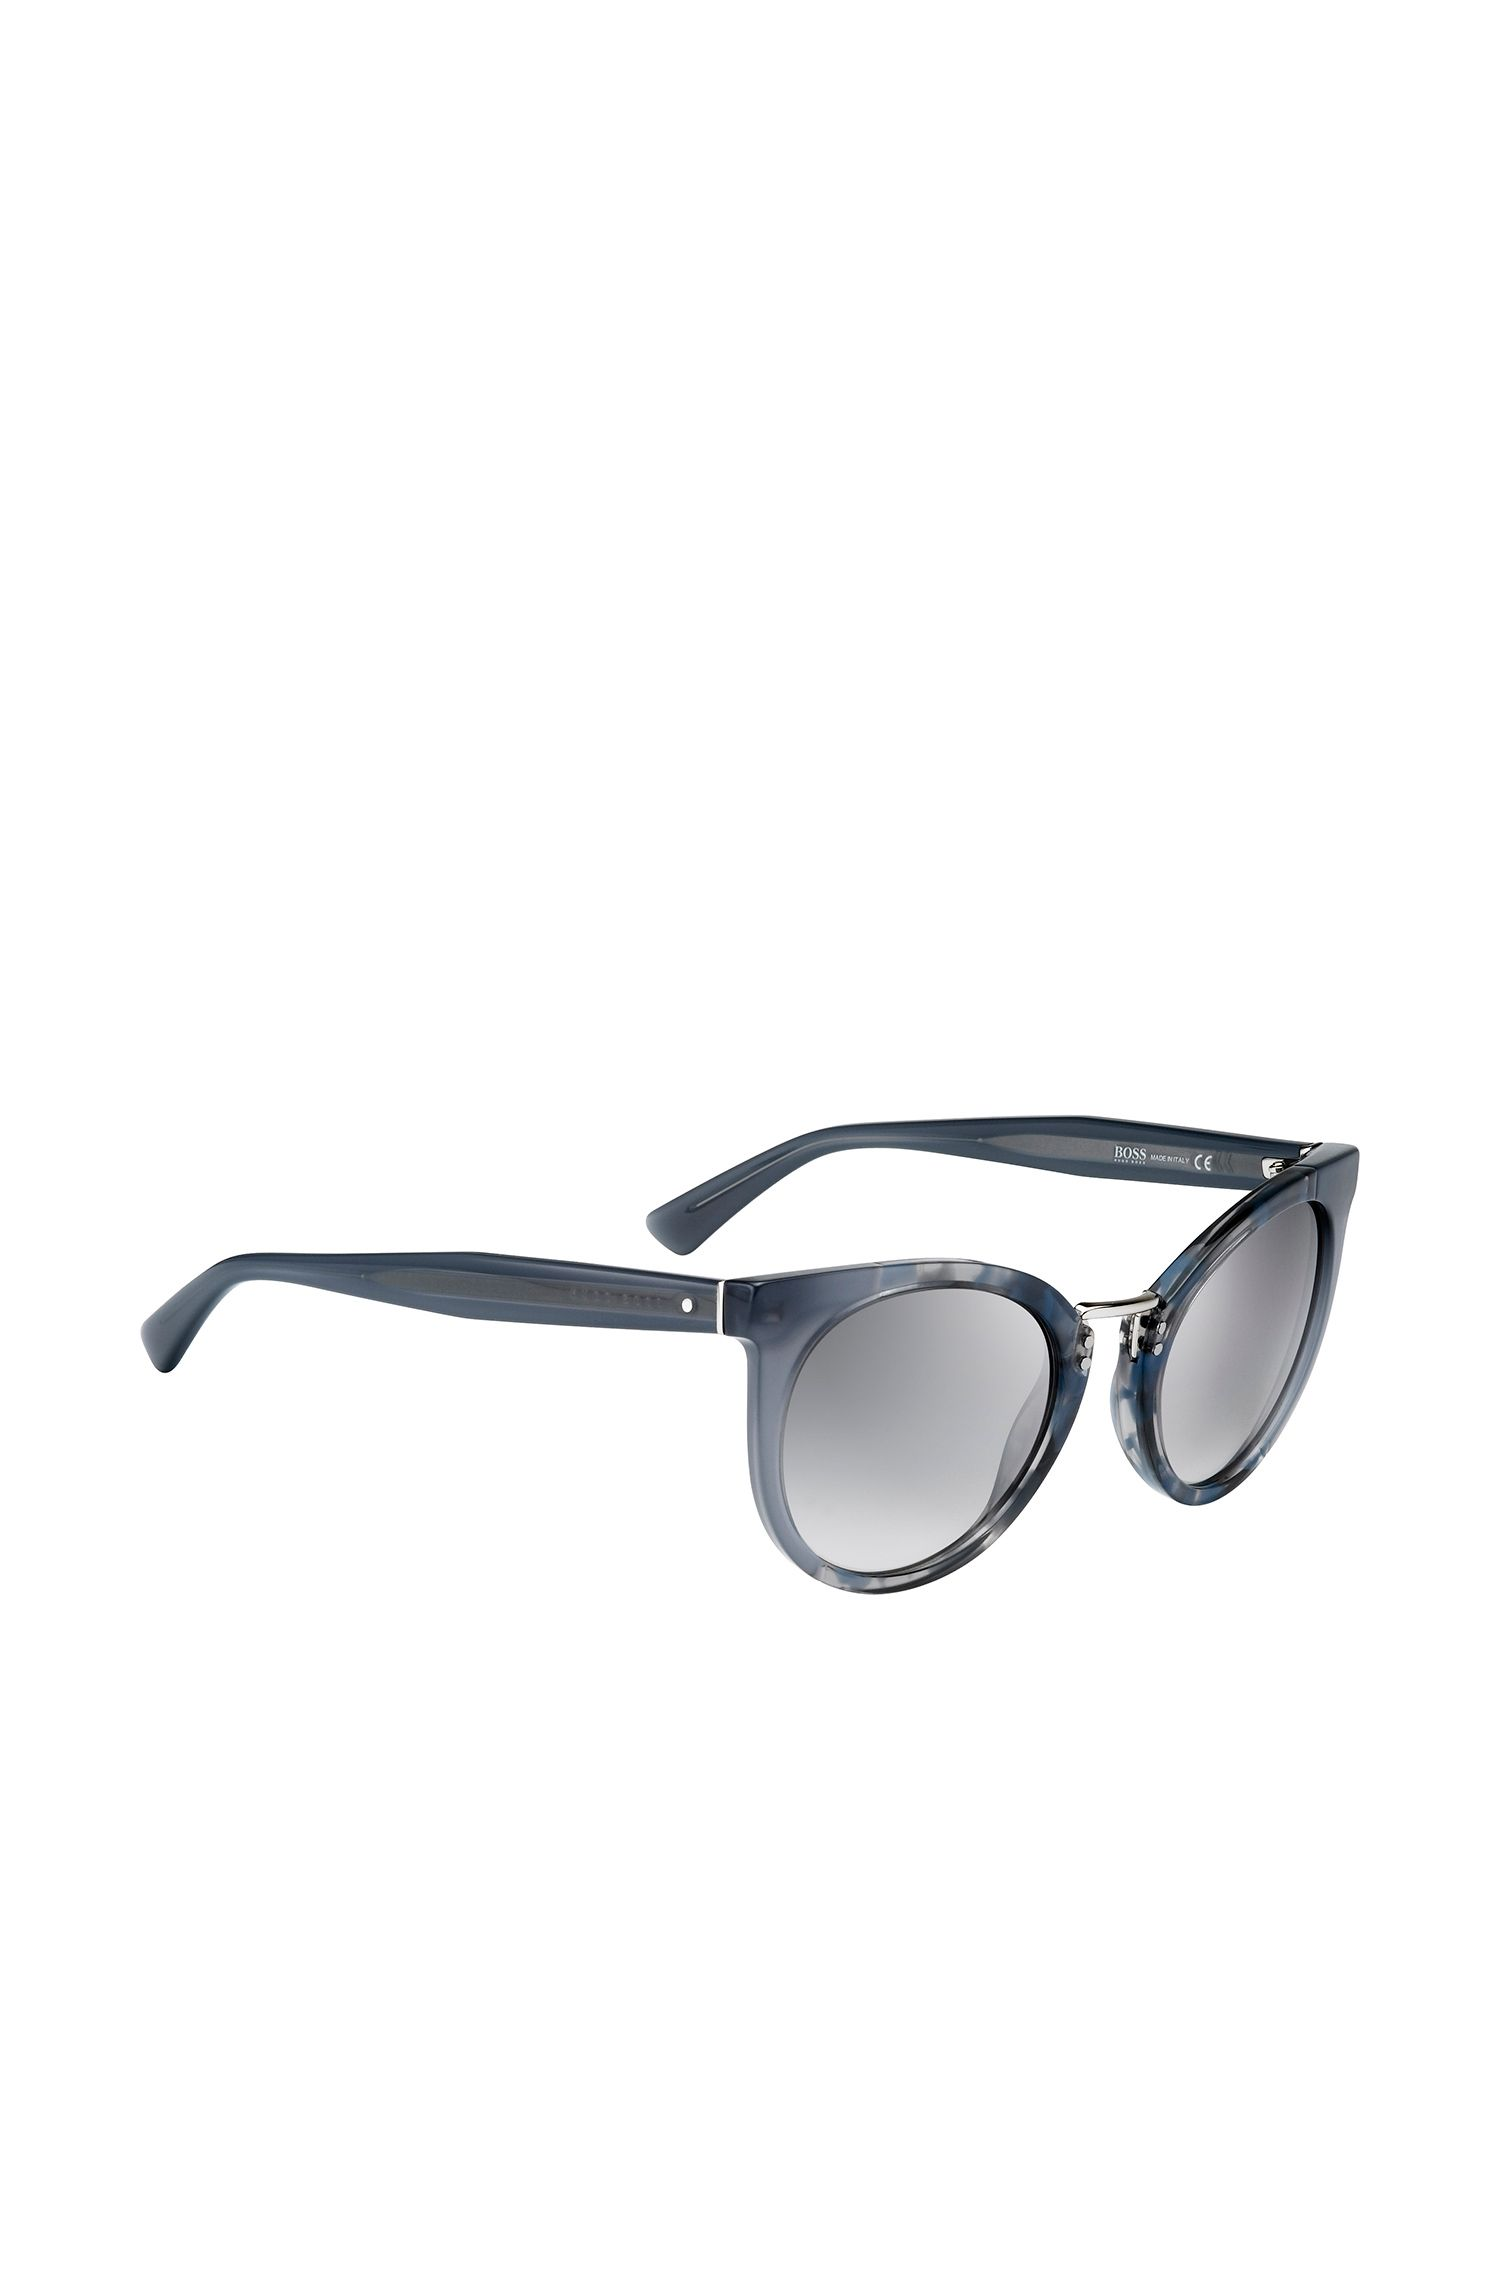 'BOSS 0793S' | Gray Lens Rounded Cateye Havana Sunglasses